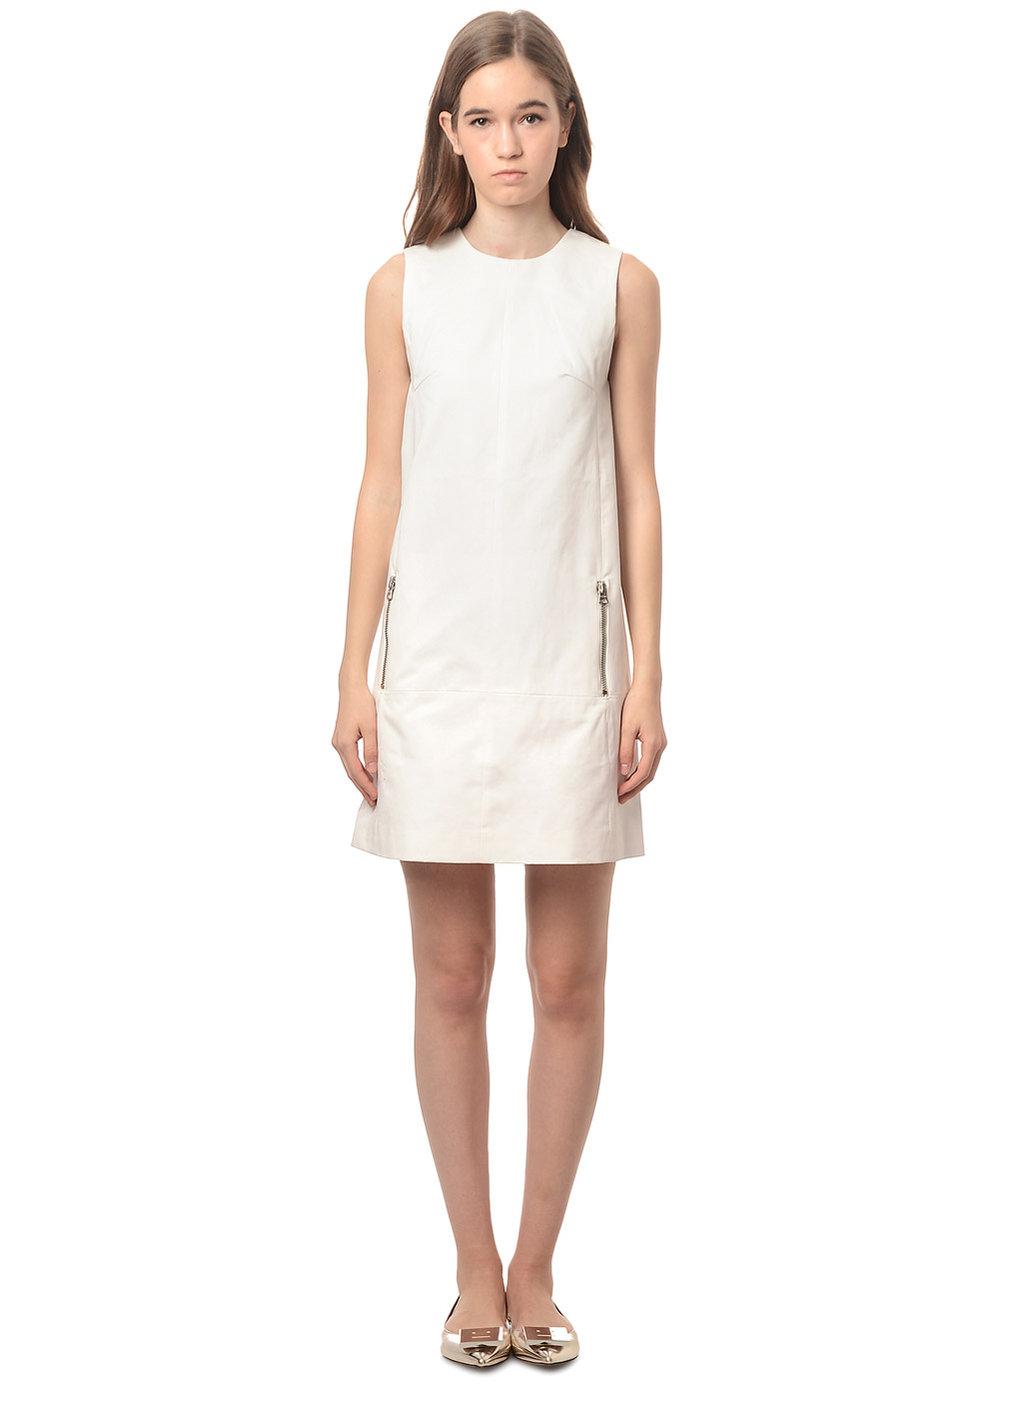 Acne Studios Dress Garmentory